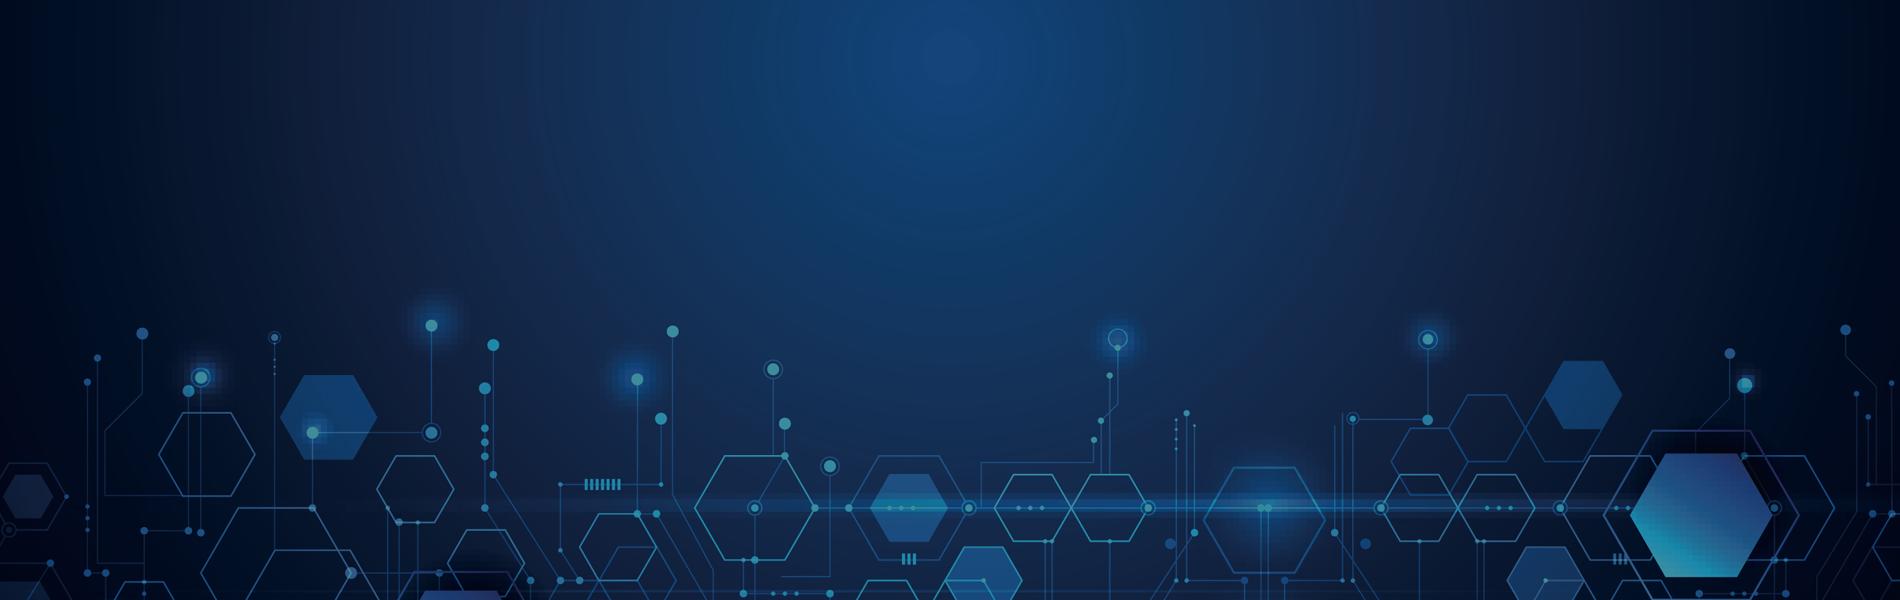 Palo Alto Networks High Availability Health | Indeni